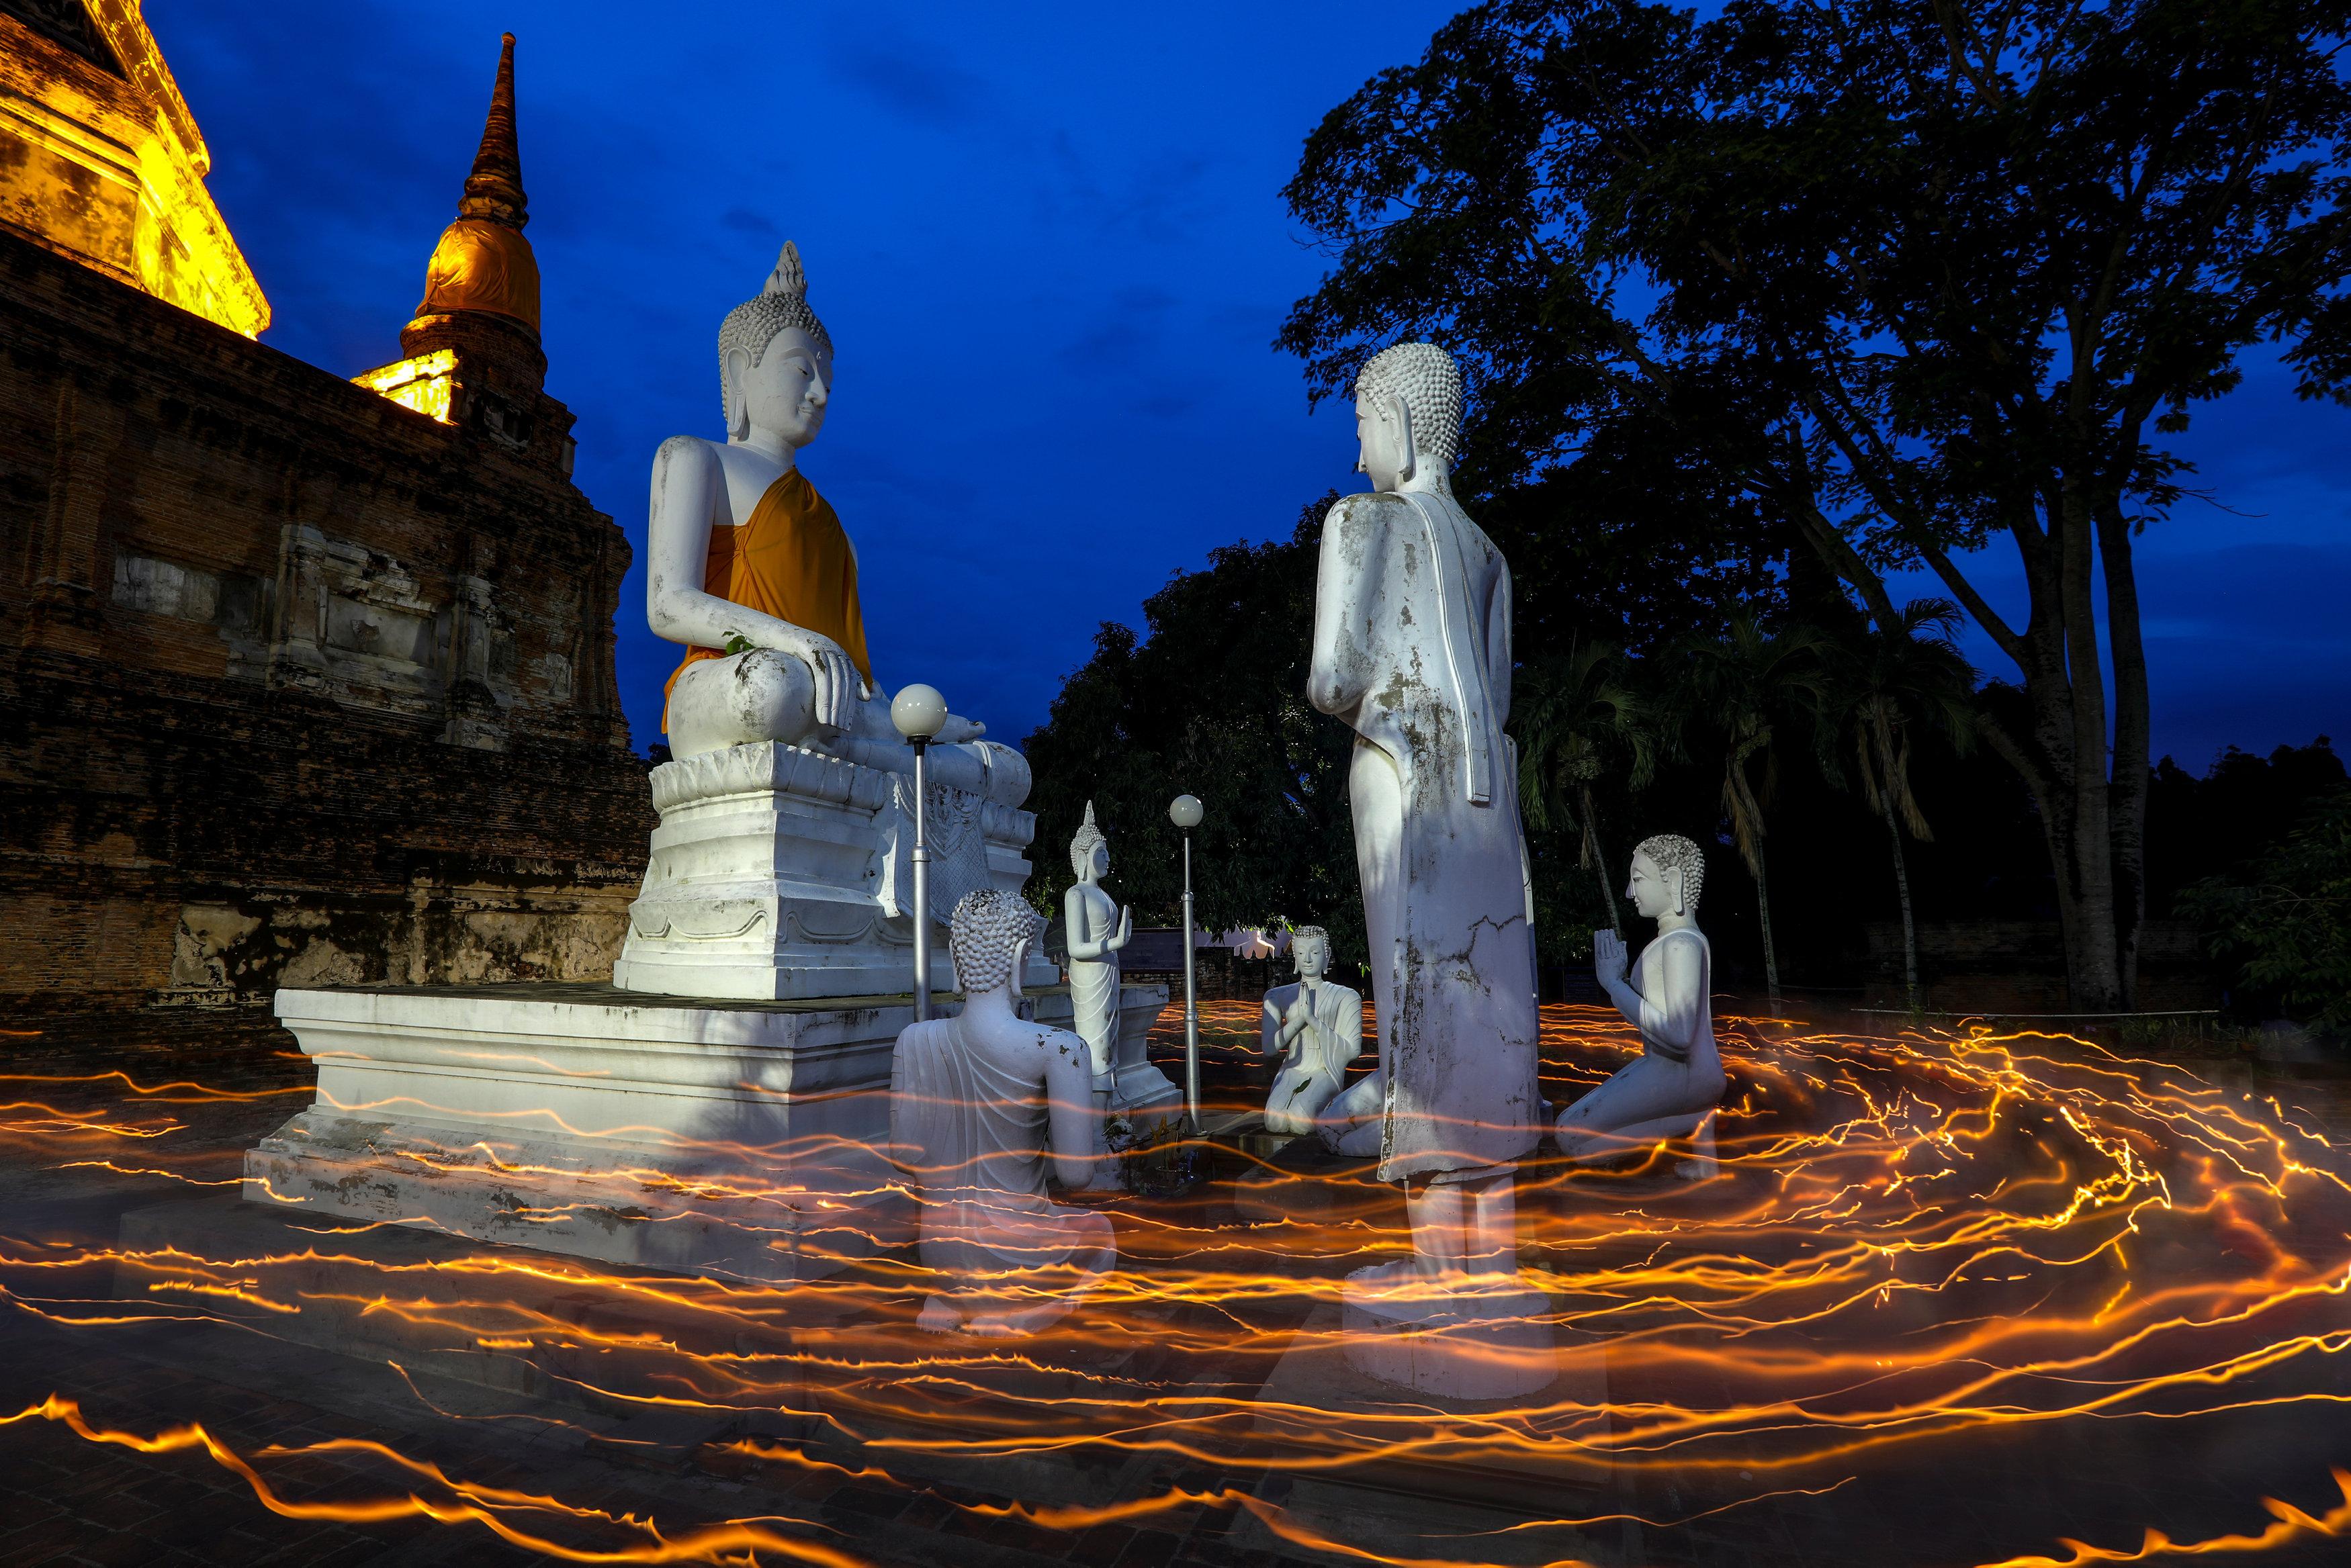 2017 05 10T141815Z 1260454895 RC12F54C3700 RTRMADP 3 RELIGION VESAK THAILAND